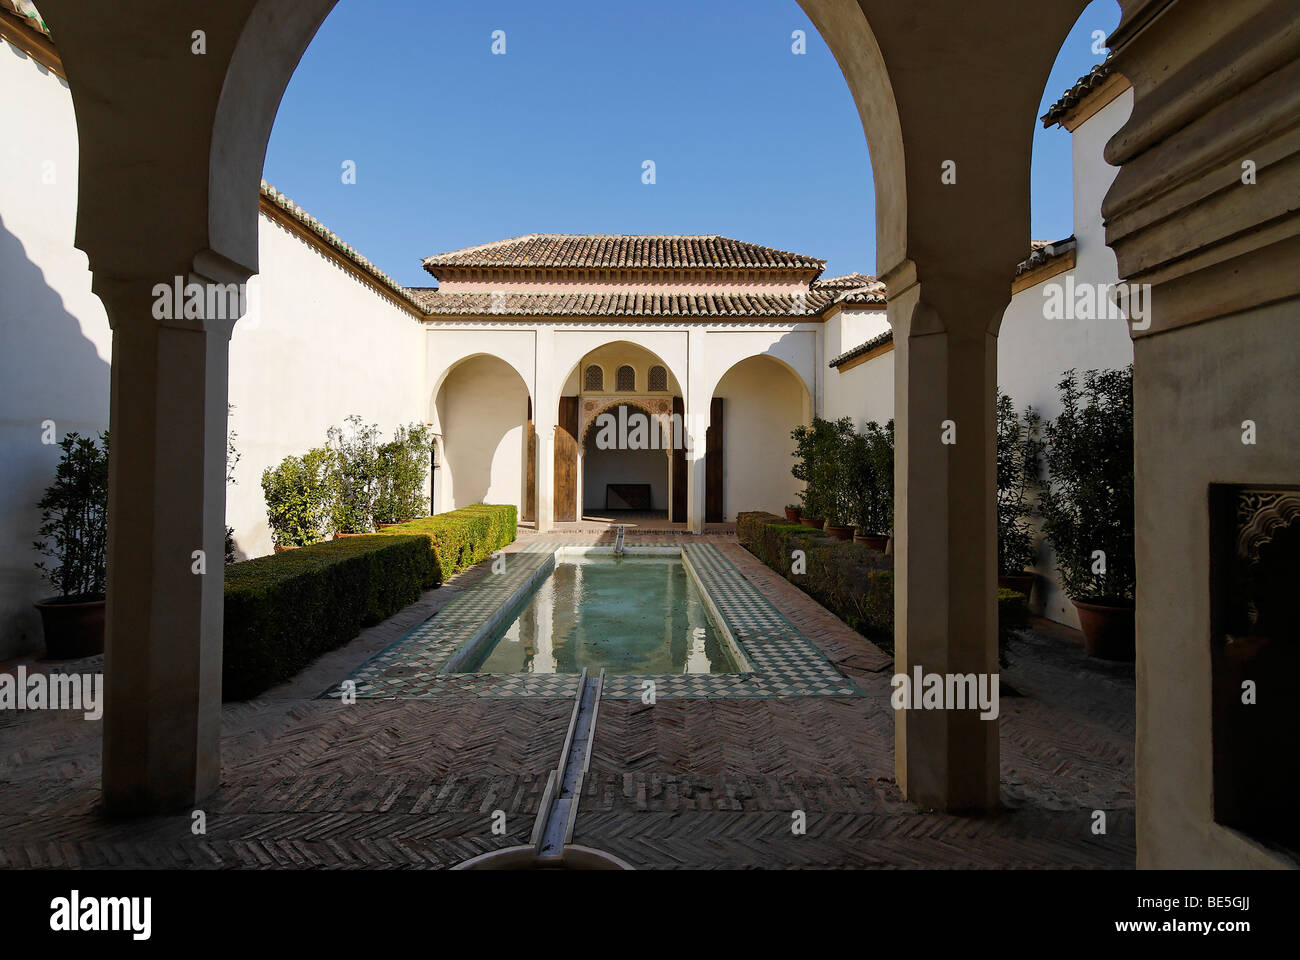 Patio De La Alberca, Alcazaba Burg, Malaga, Andalusien, Spanien, Europa Stockbild